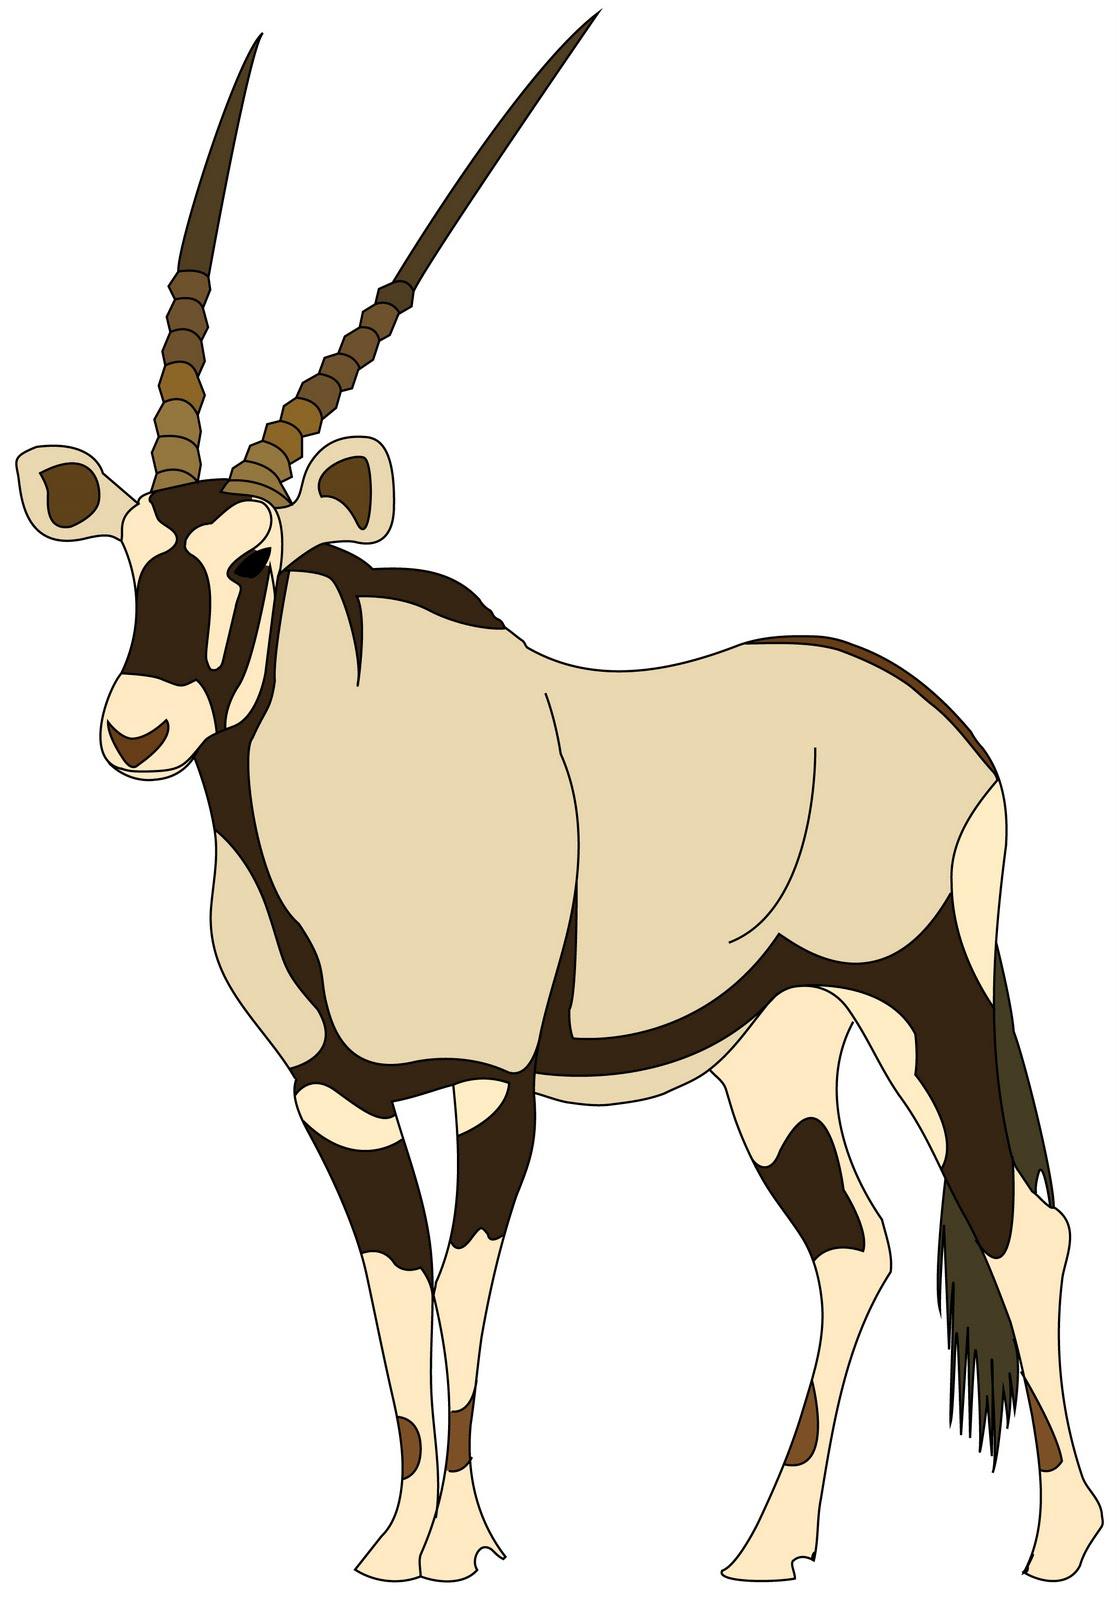 Antelope clipart #5, Download drawings